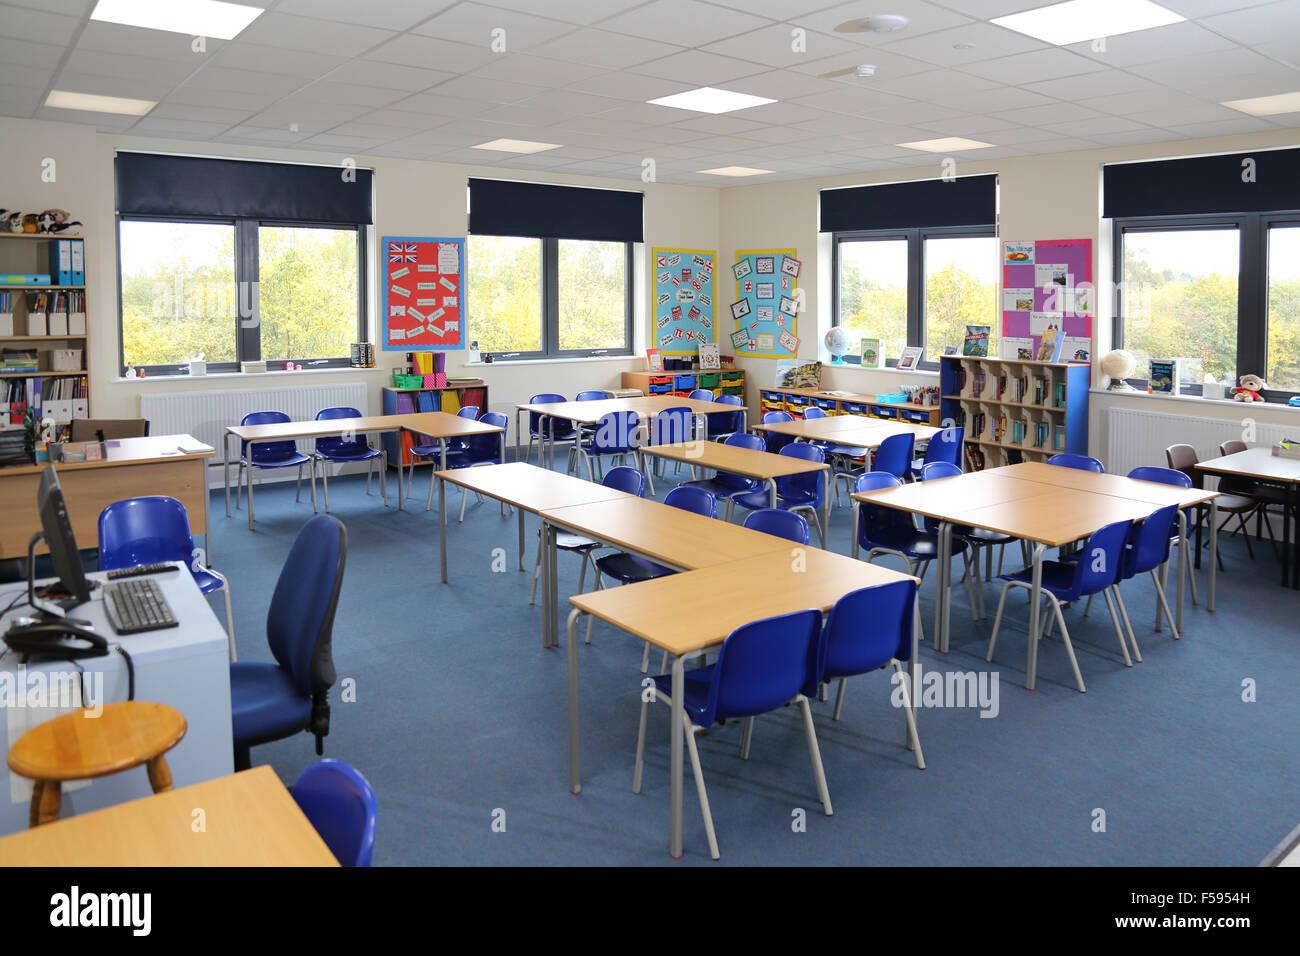 Classroom Furniture Uk : A classroom in newly built uk junior school shows desks